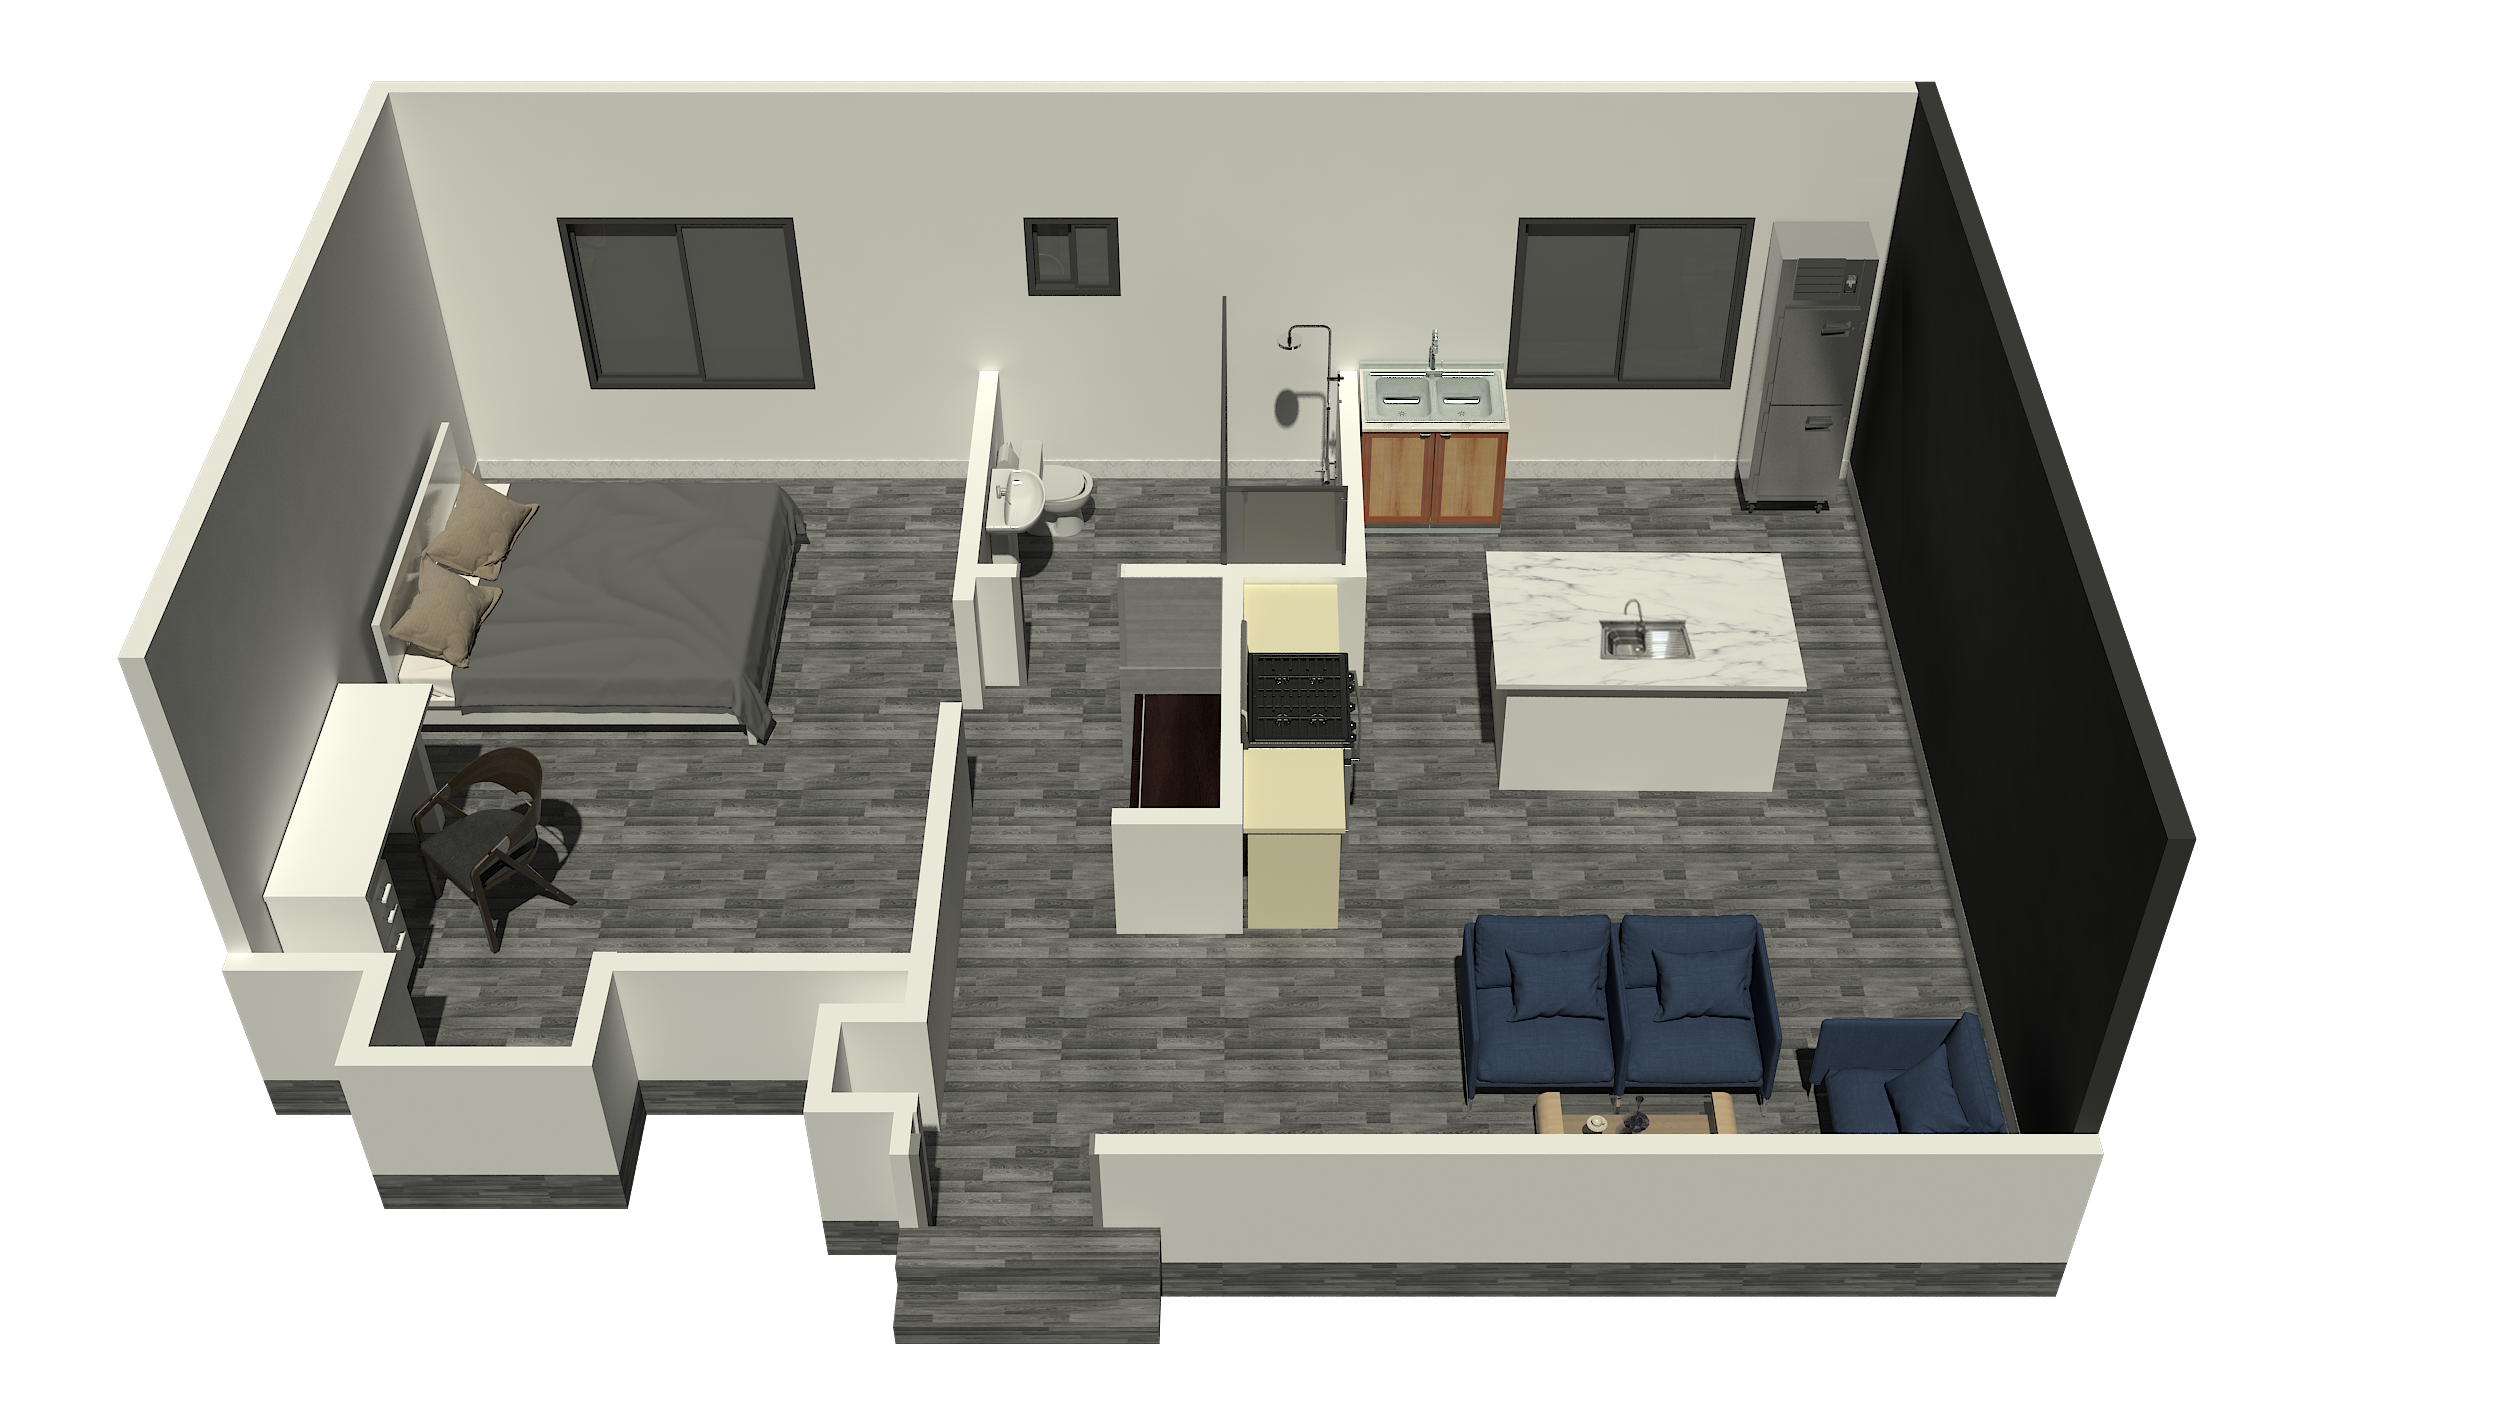 Ethanjaxson I Will Create Architecture Floor Plans 3d Floor Plan 2d Floor Plan For 5 On Fiverr Com Architecture Architecture Rendering Floor Plans